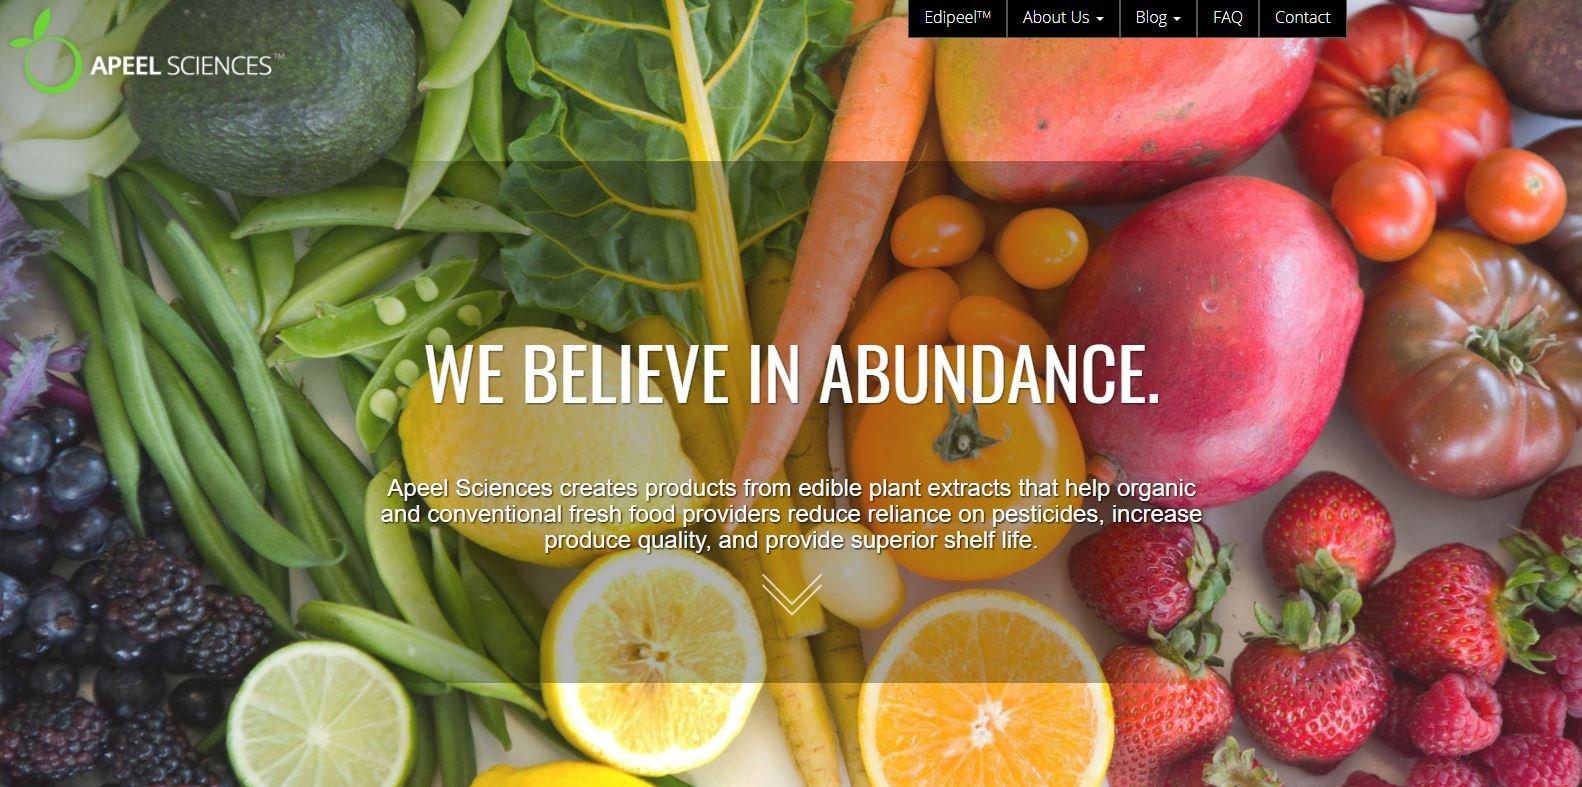 apeel sciences food tech digital marketing